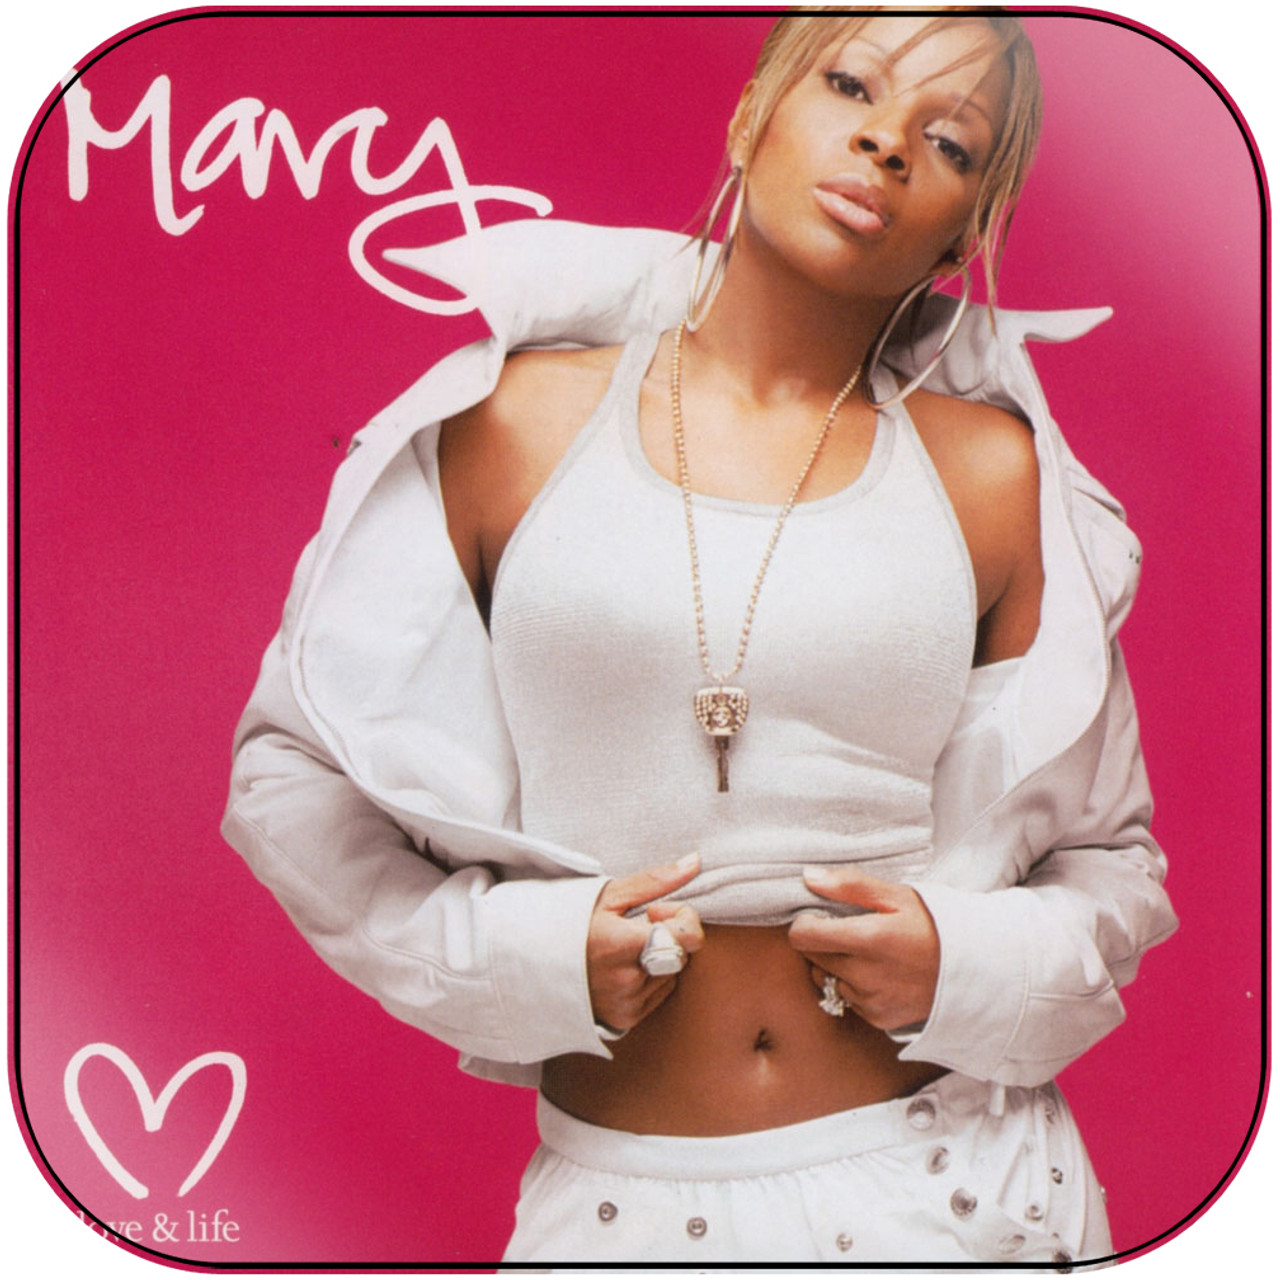 Mary J Blige - Reflections A Retrospective Album Cover Sticker Album Cover  Sticker